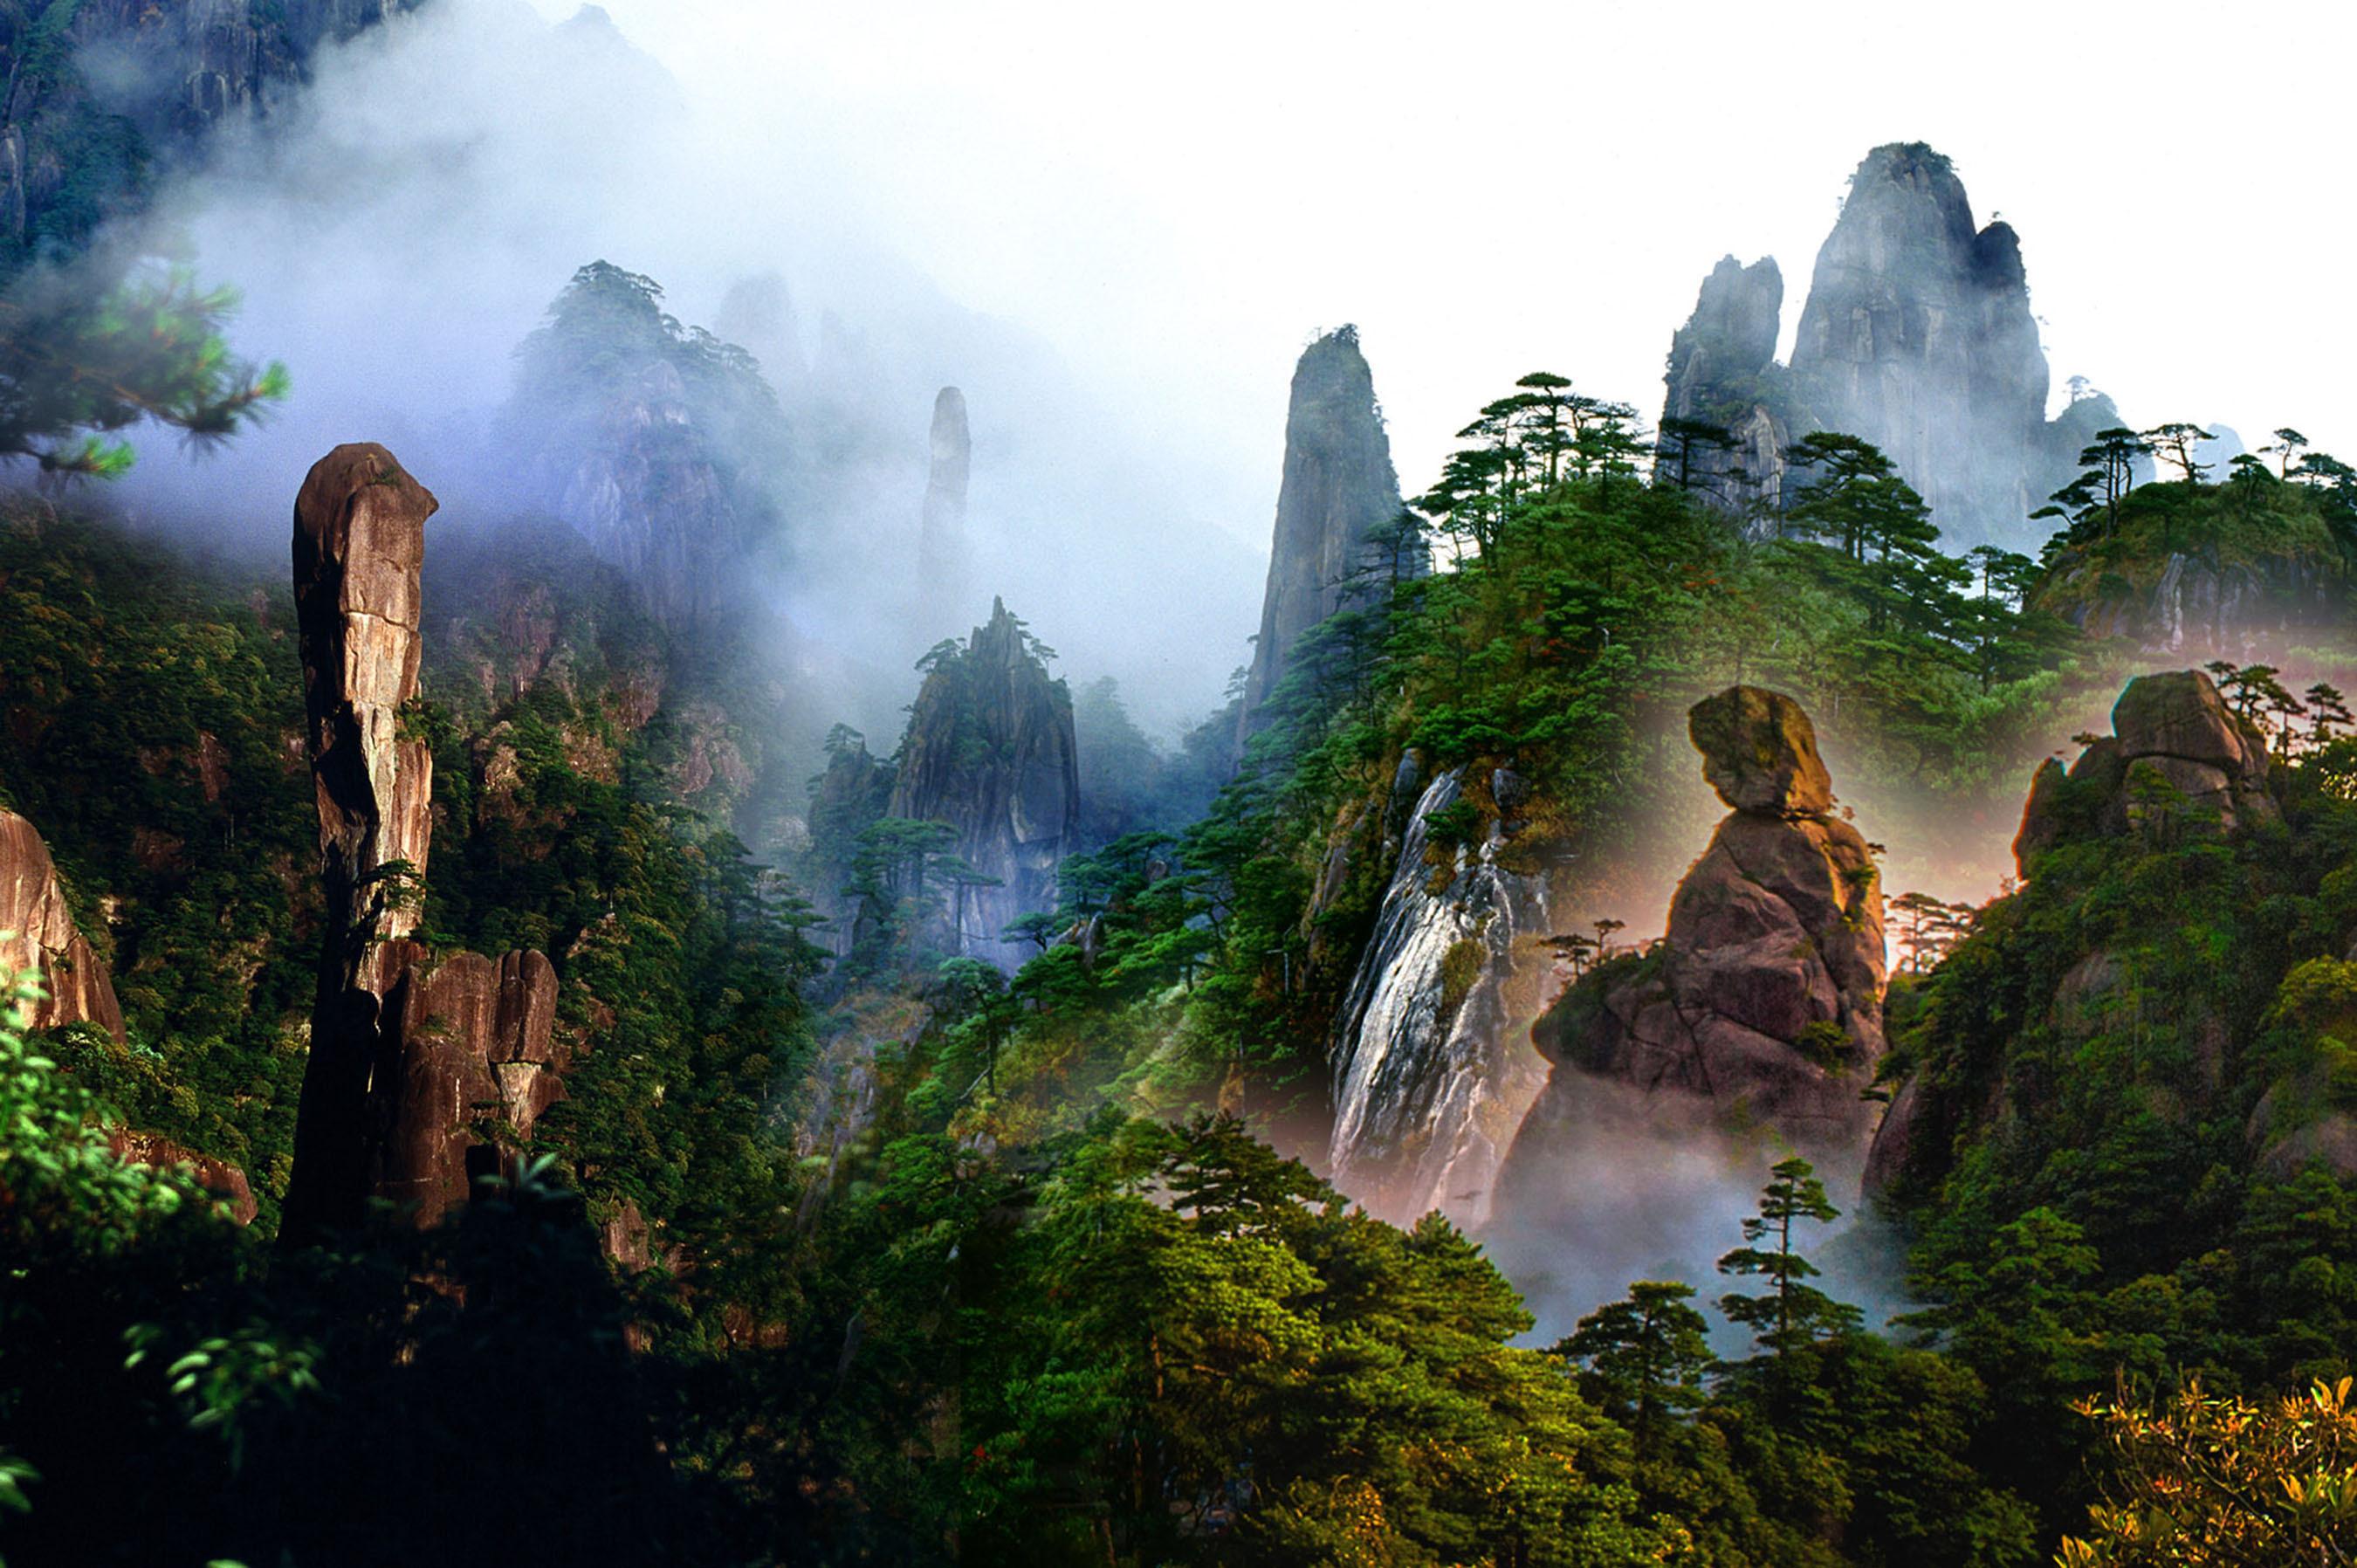 Sanqing Mountain, China.